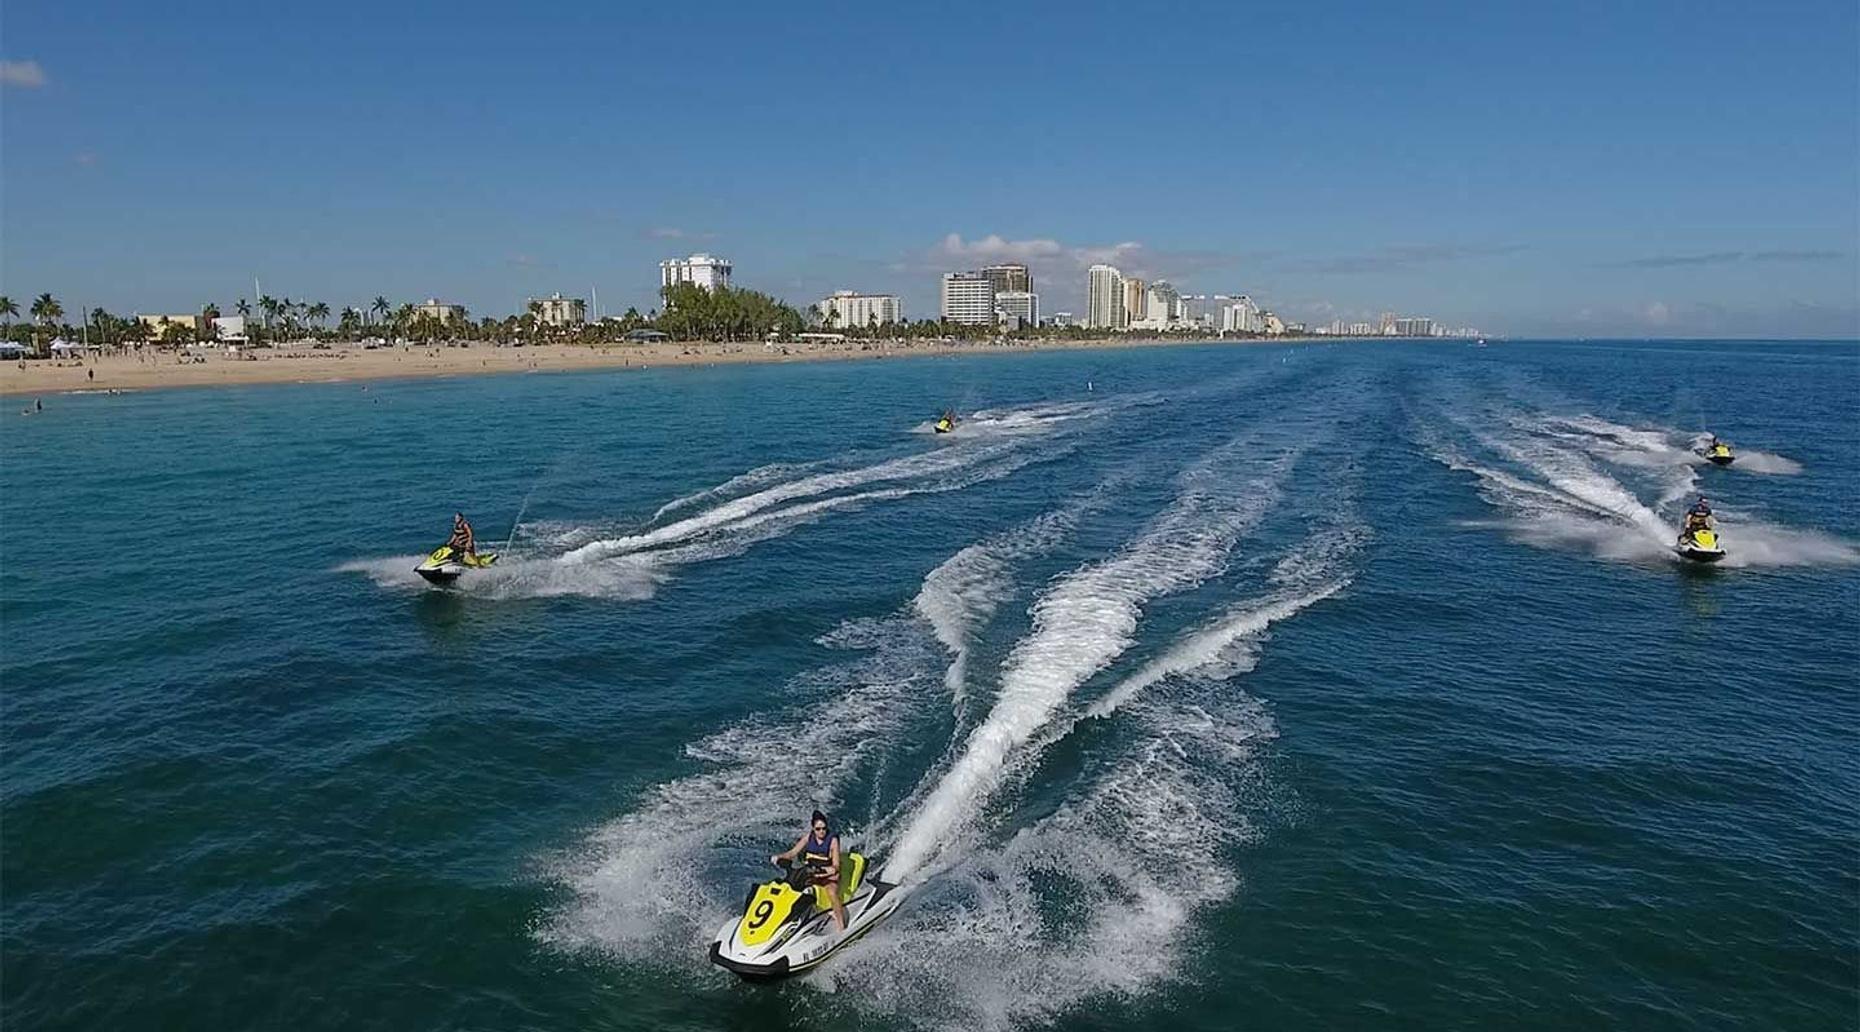 30 Minute Jet Ski Rental in Fort Lauderdale